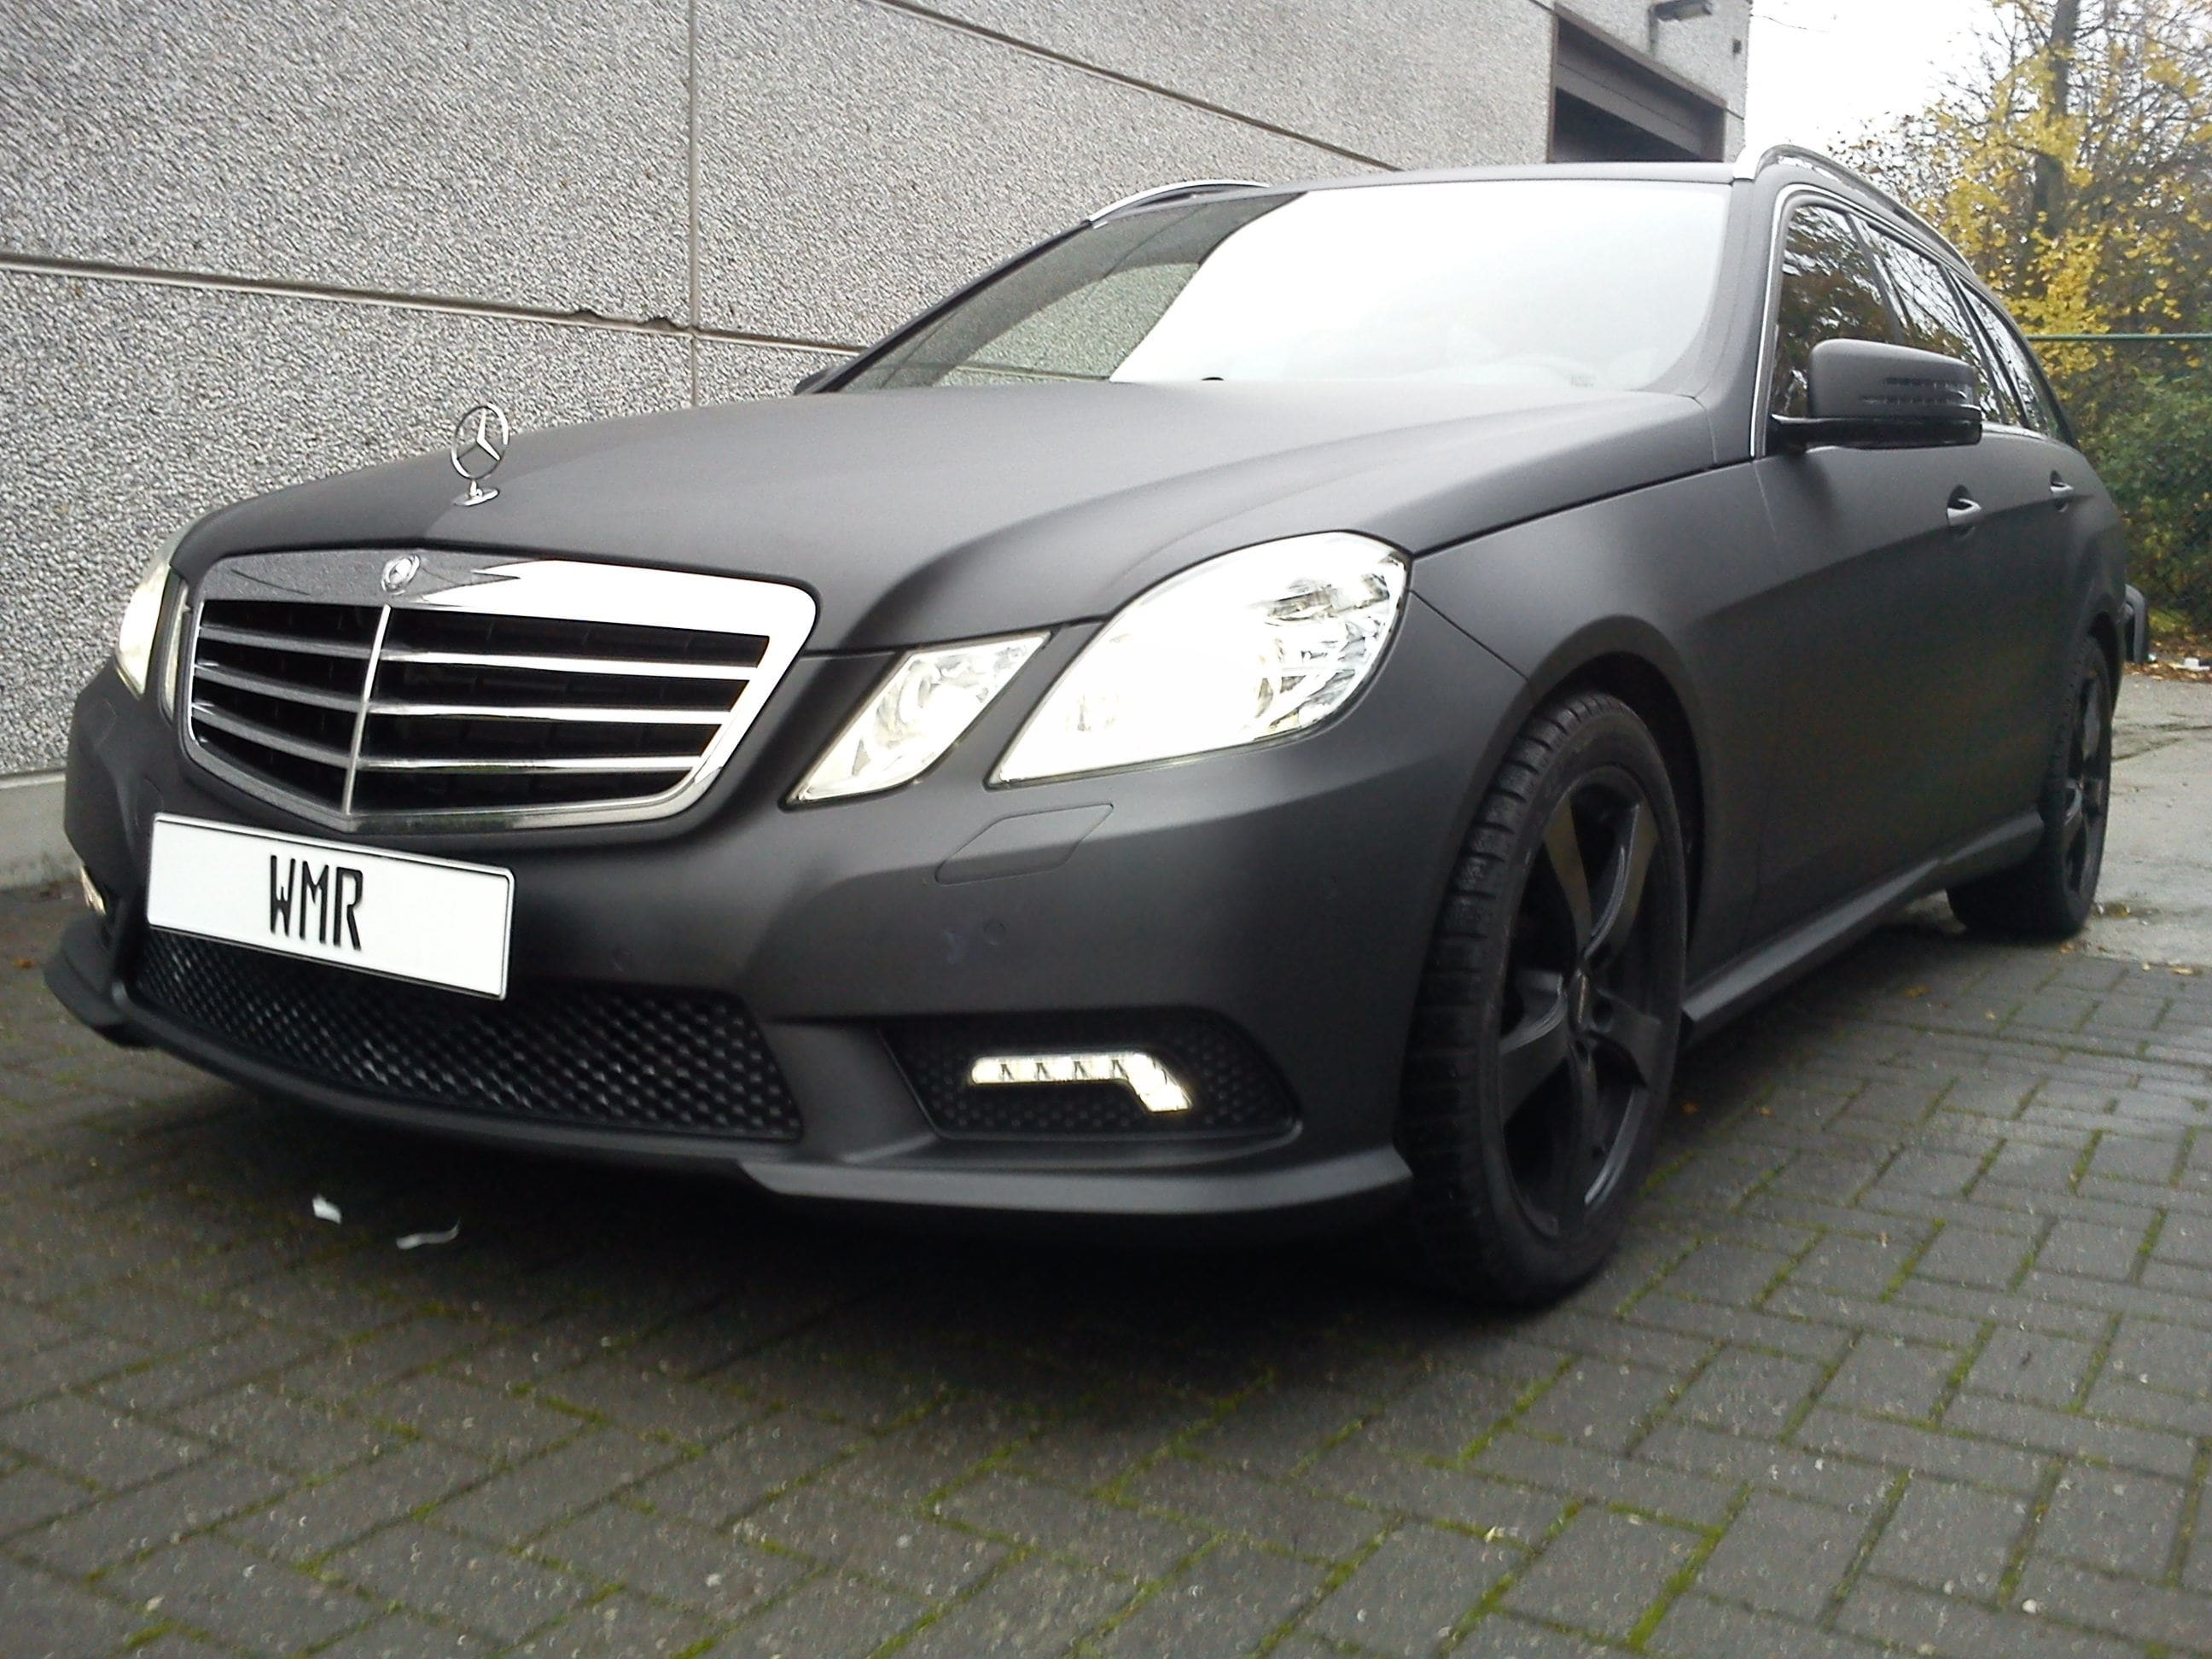 Mercedes E320 met Mat Zwarte Wrap, Carwrapping door Wrapmyride.nu Foto-nr:6228, ©2020